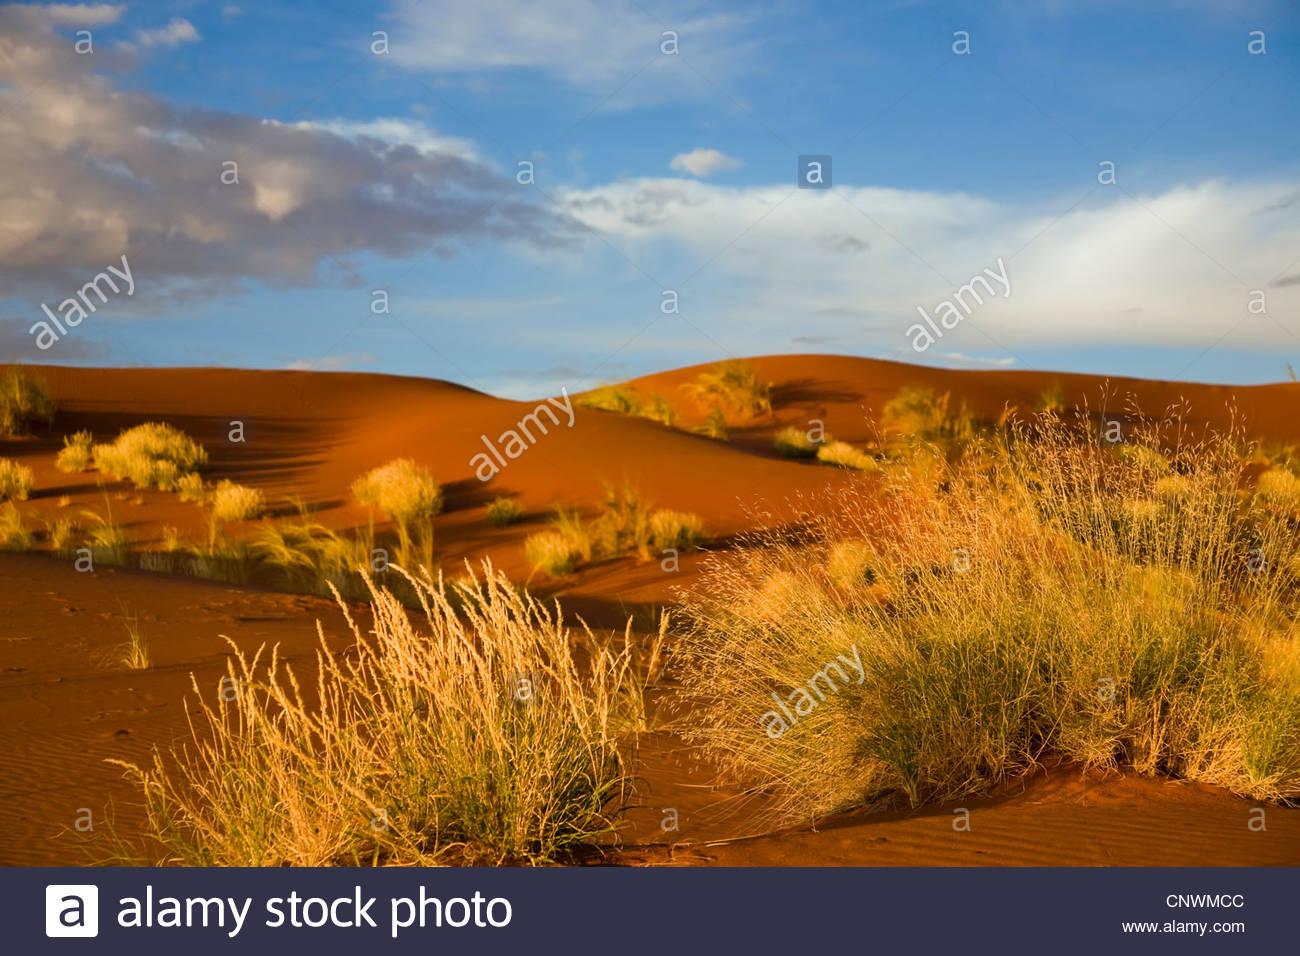 dune grasses in Namib desert, Namibia, Namibrand - Stock Image